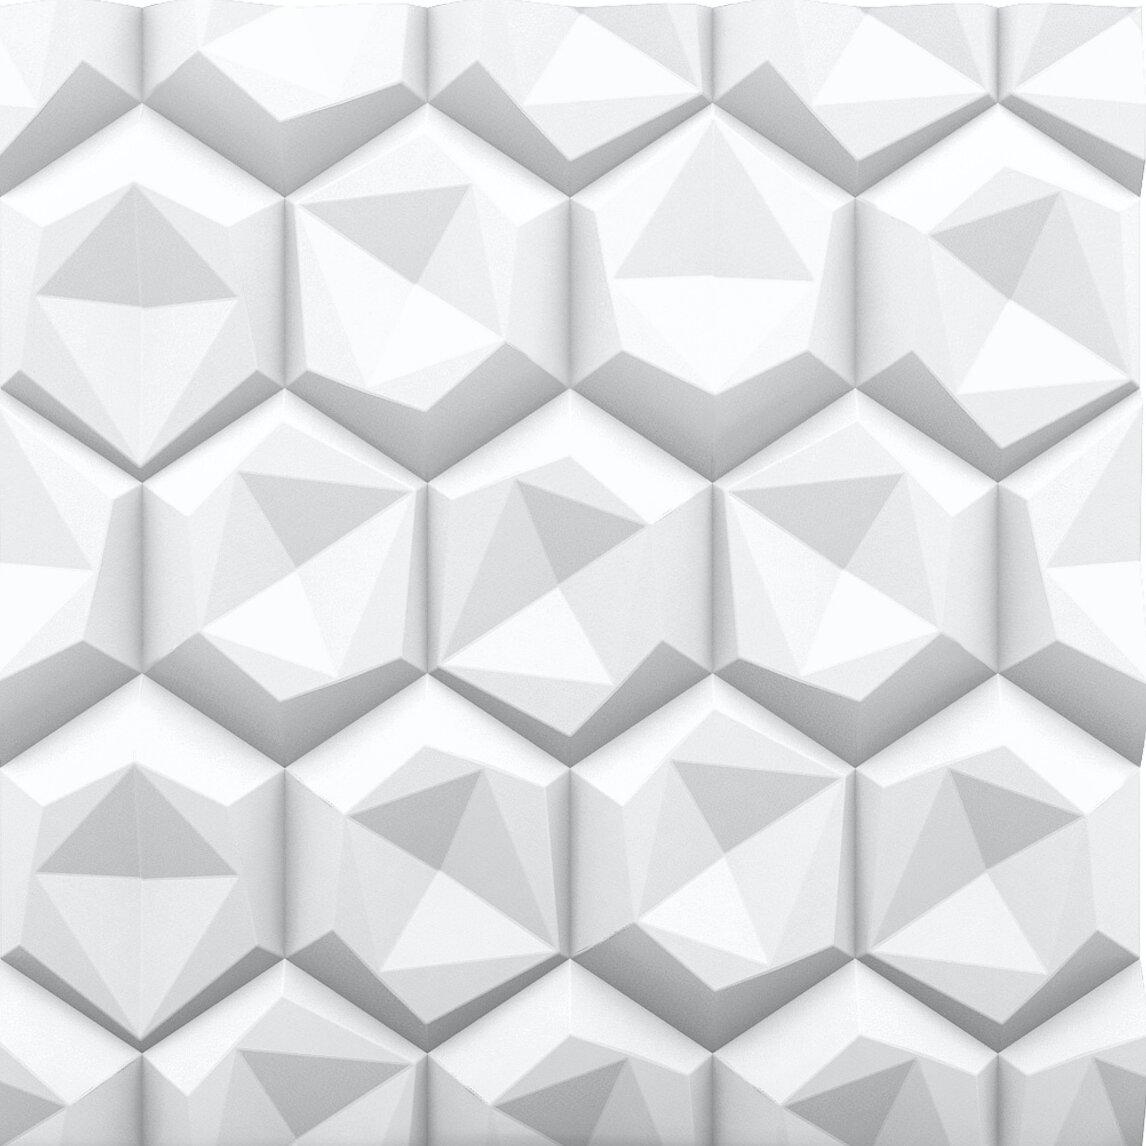 Decorative PVC Cladding Panels Silver Impressions Wall Cladding Panel Sample